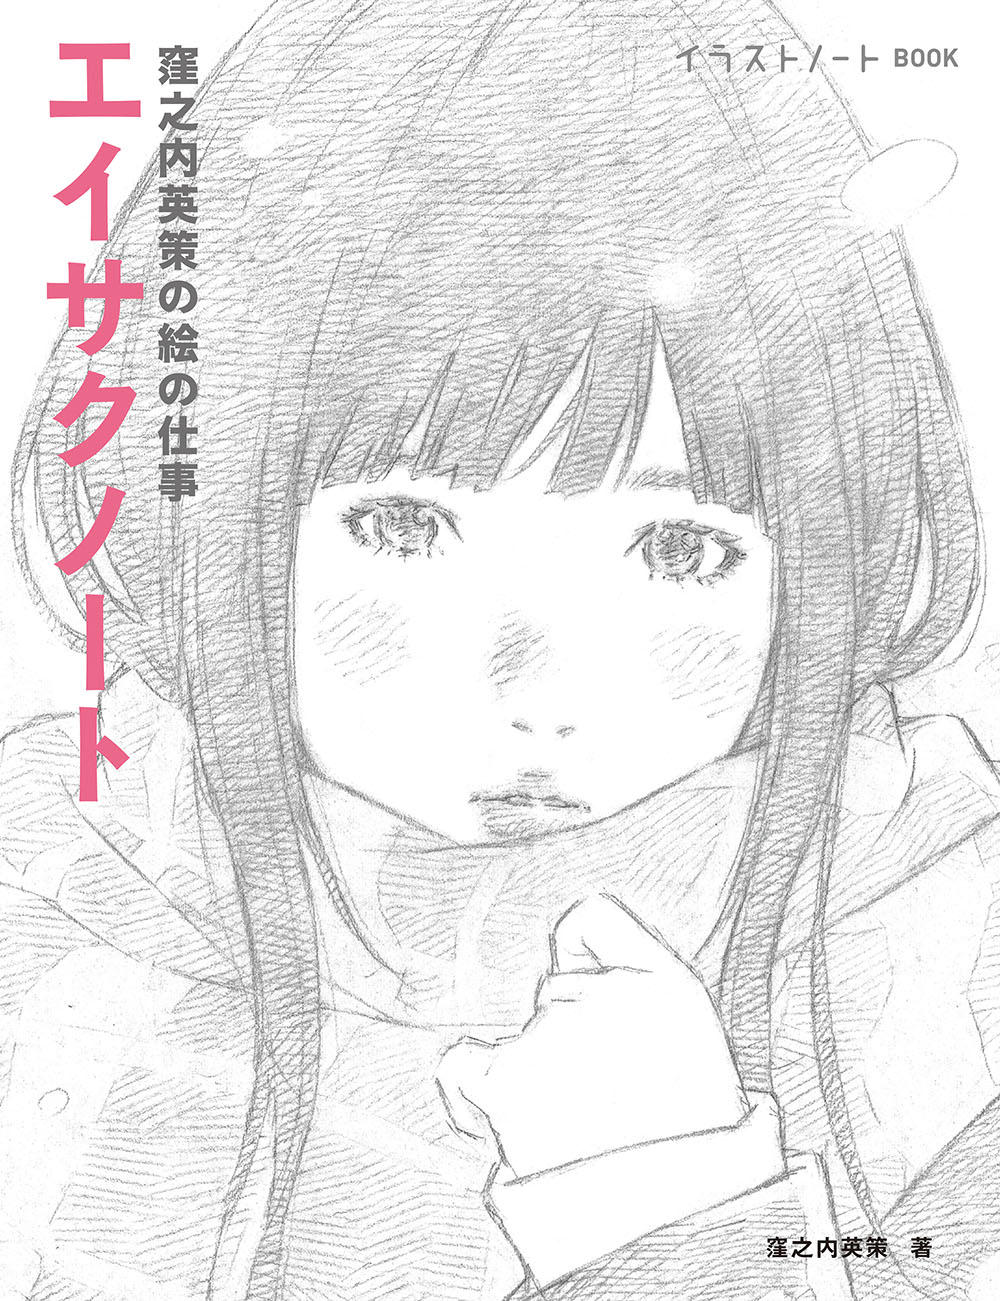 book_2104_eisakunote_sub5.jpg